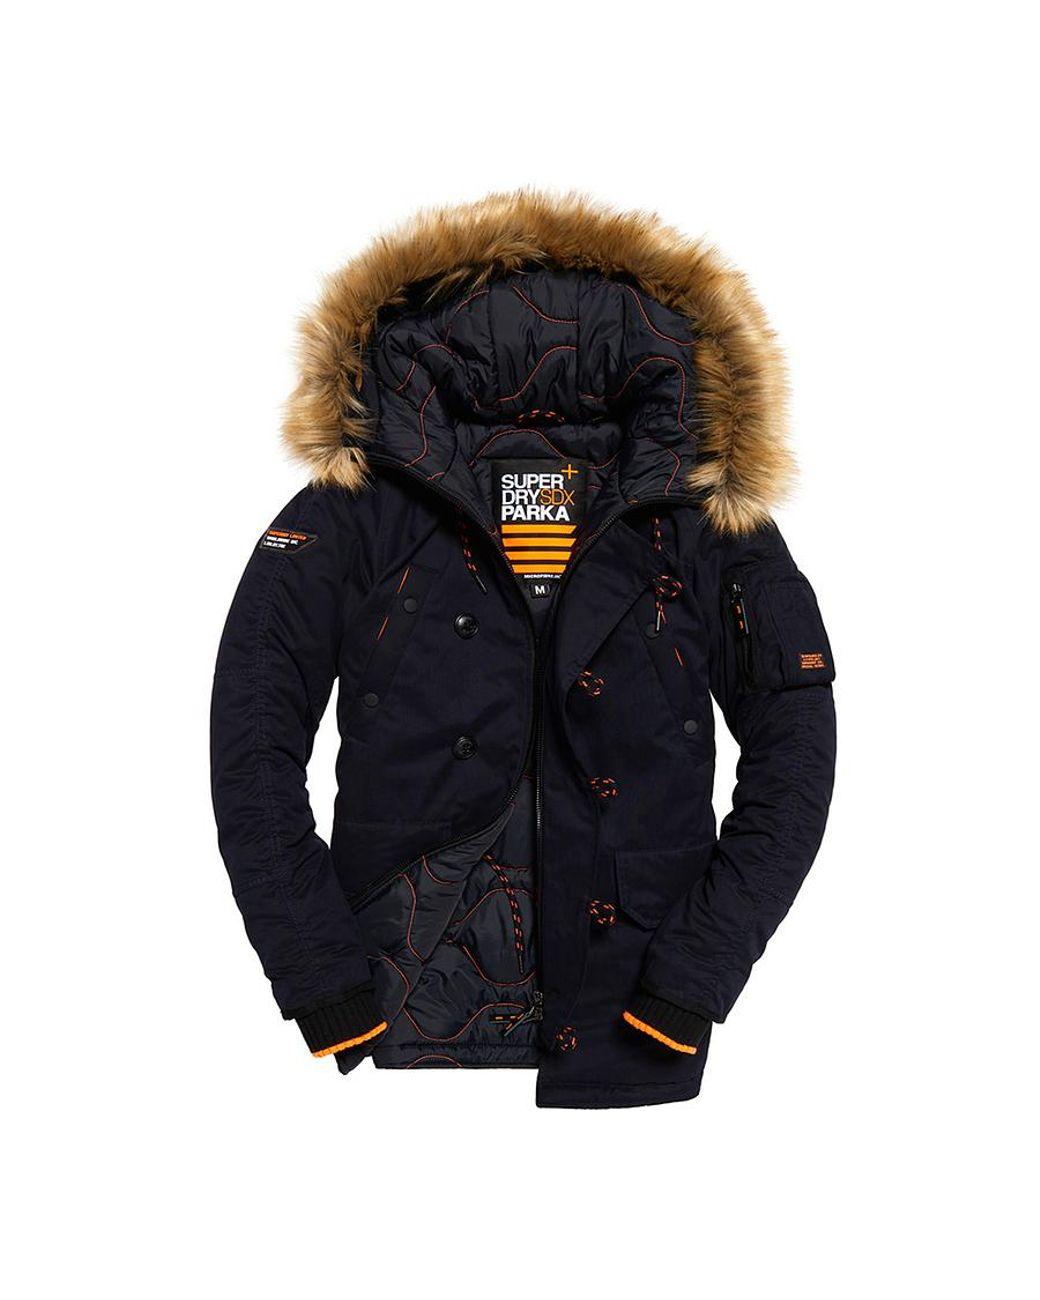 4d807eb8b61645 Superdry Sdx Parka Jacket in Blue for Men - Save 53% - Lyst